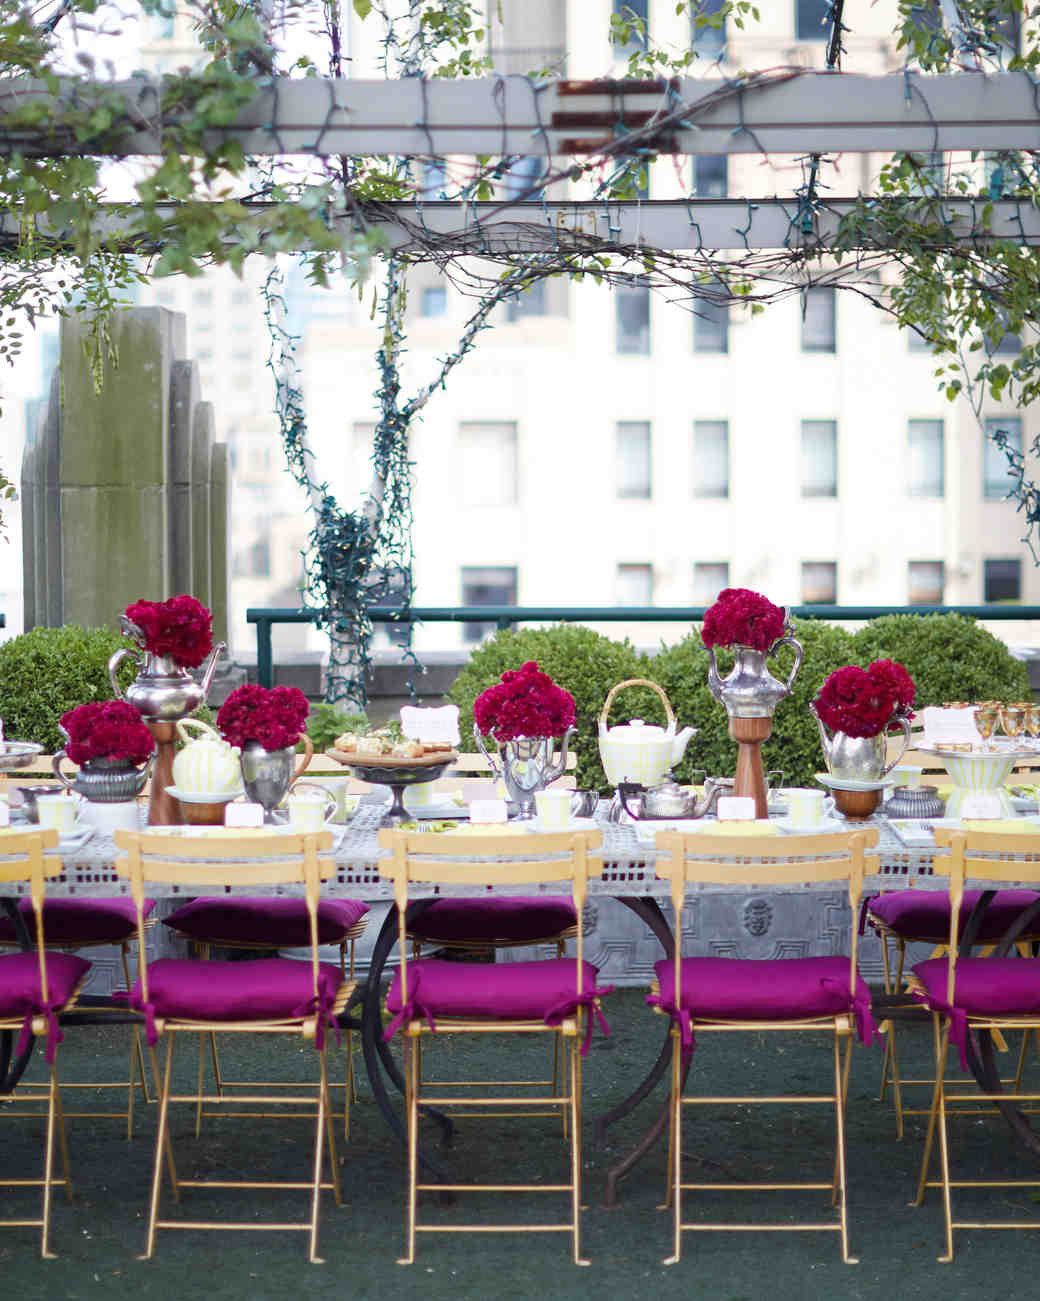 lela-rose-pret-a-party-book-launch-tea-quila-rooftop-0915.jpg